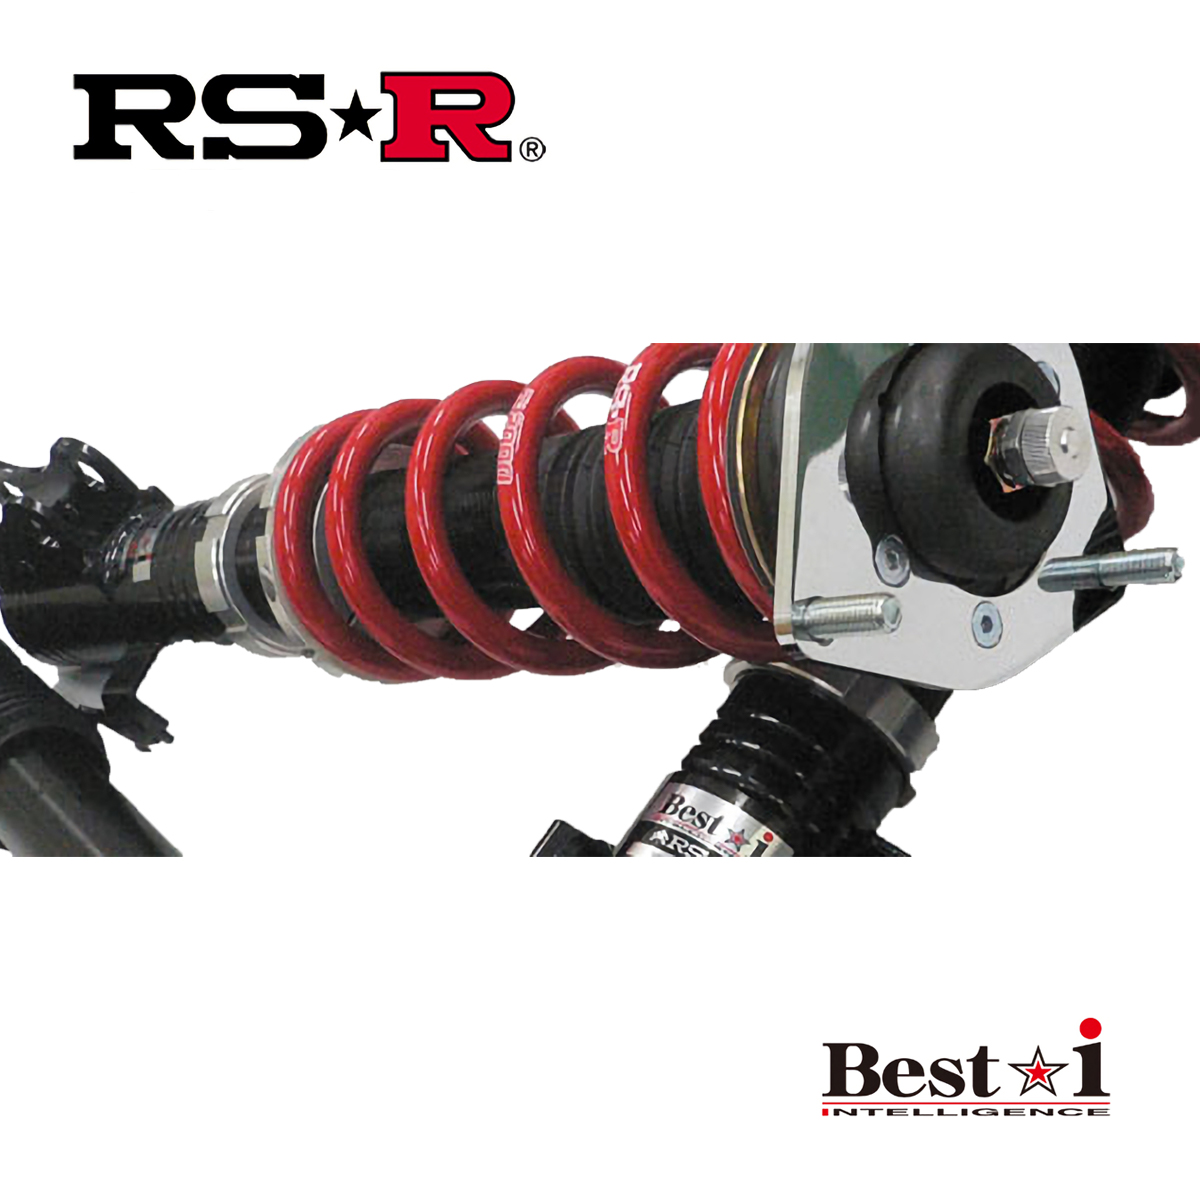 RS-R デリカD5 CV1W アーバンギアG 車高調 リア車高調整:ネジ式 BIB636M ベストi RSR 条件付き送料無料